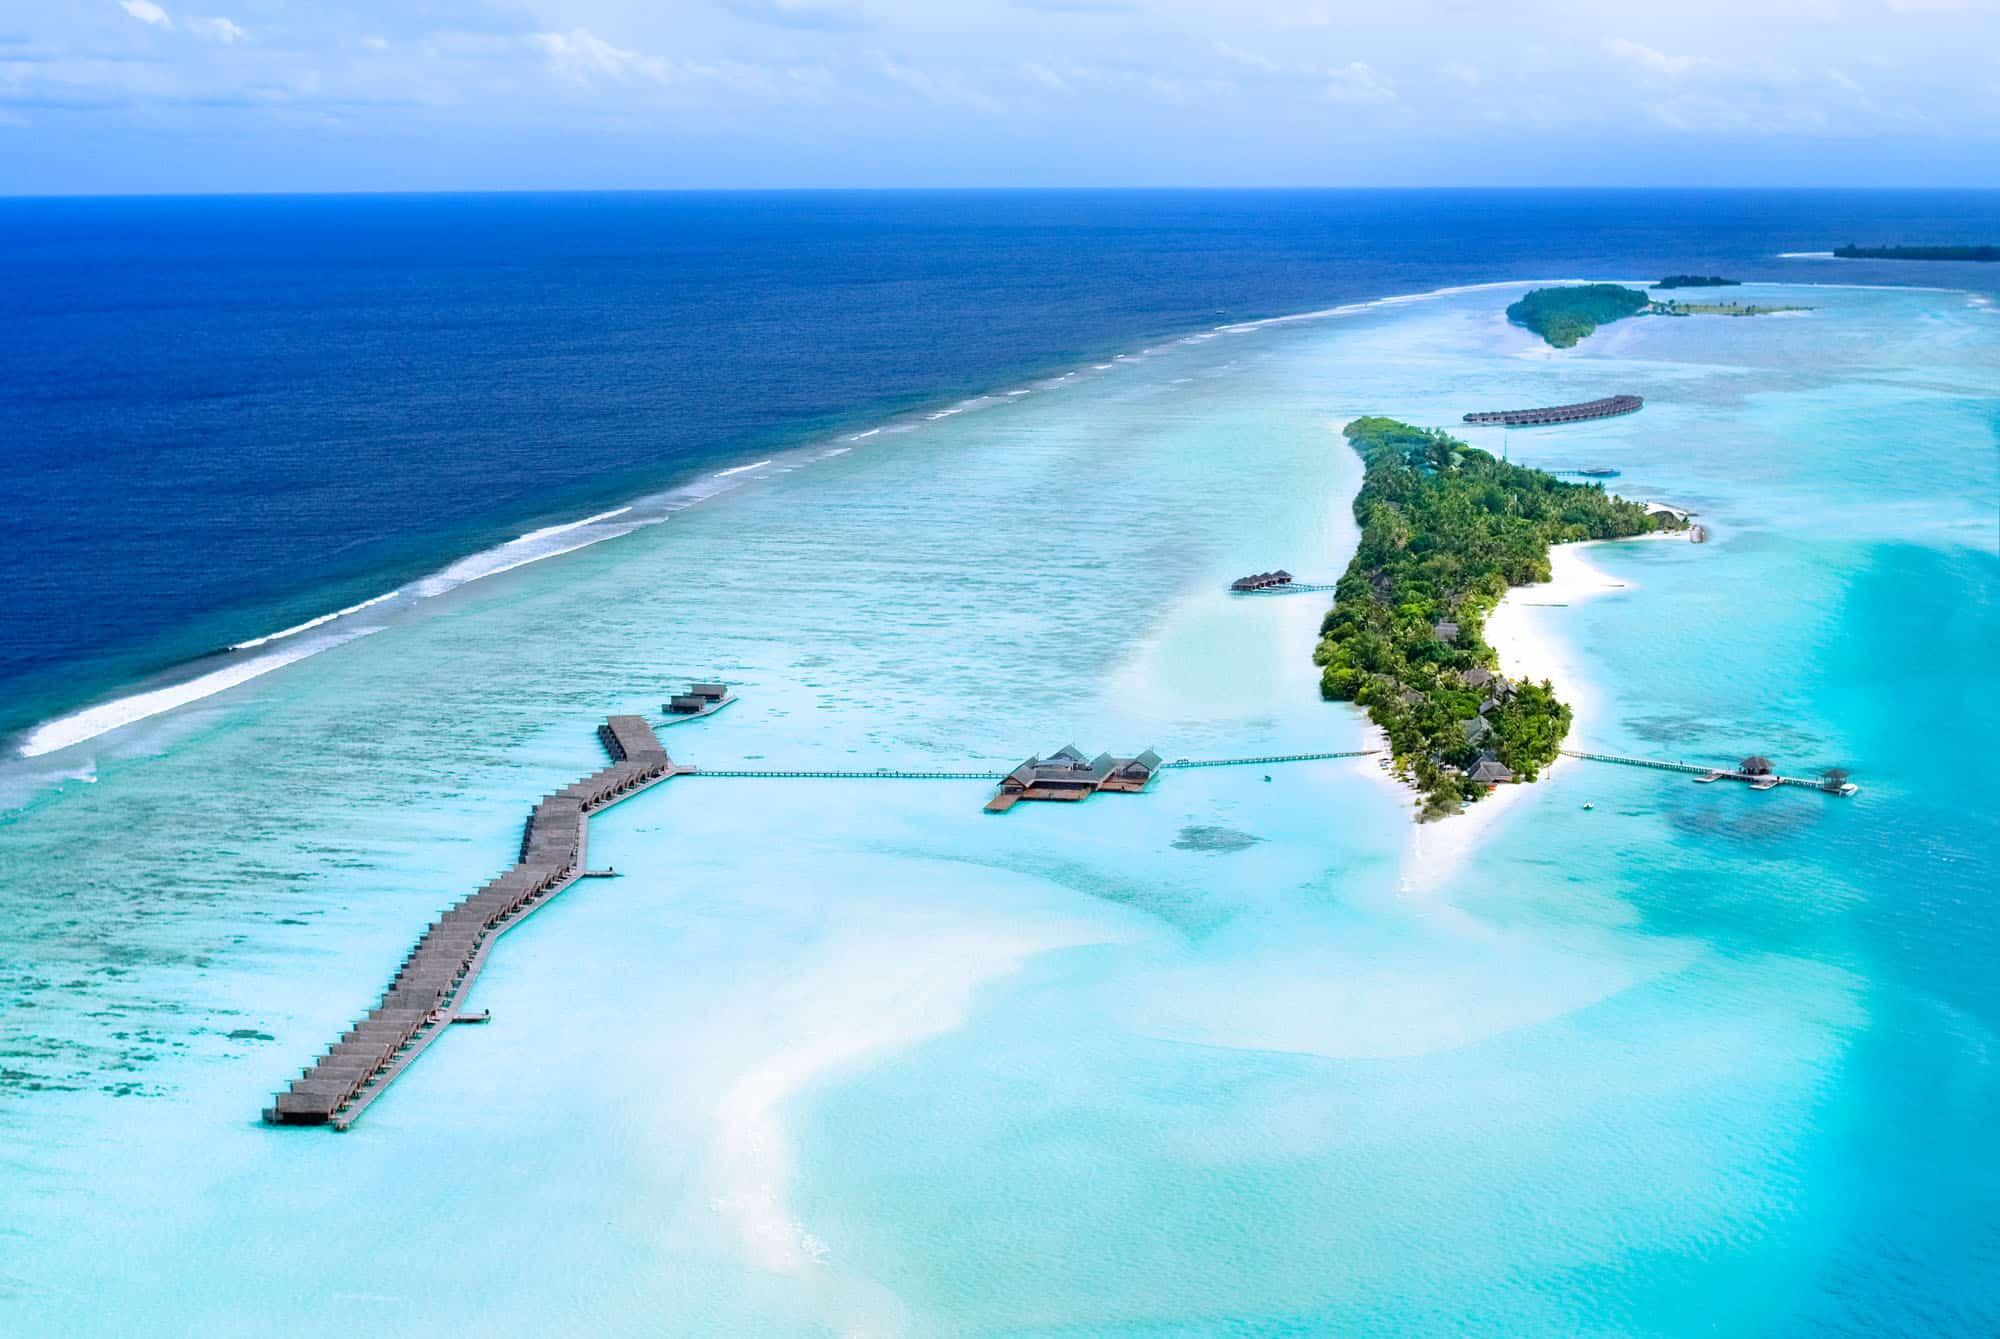 5 Star LUX* Maldives Resort